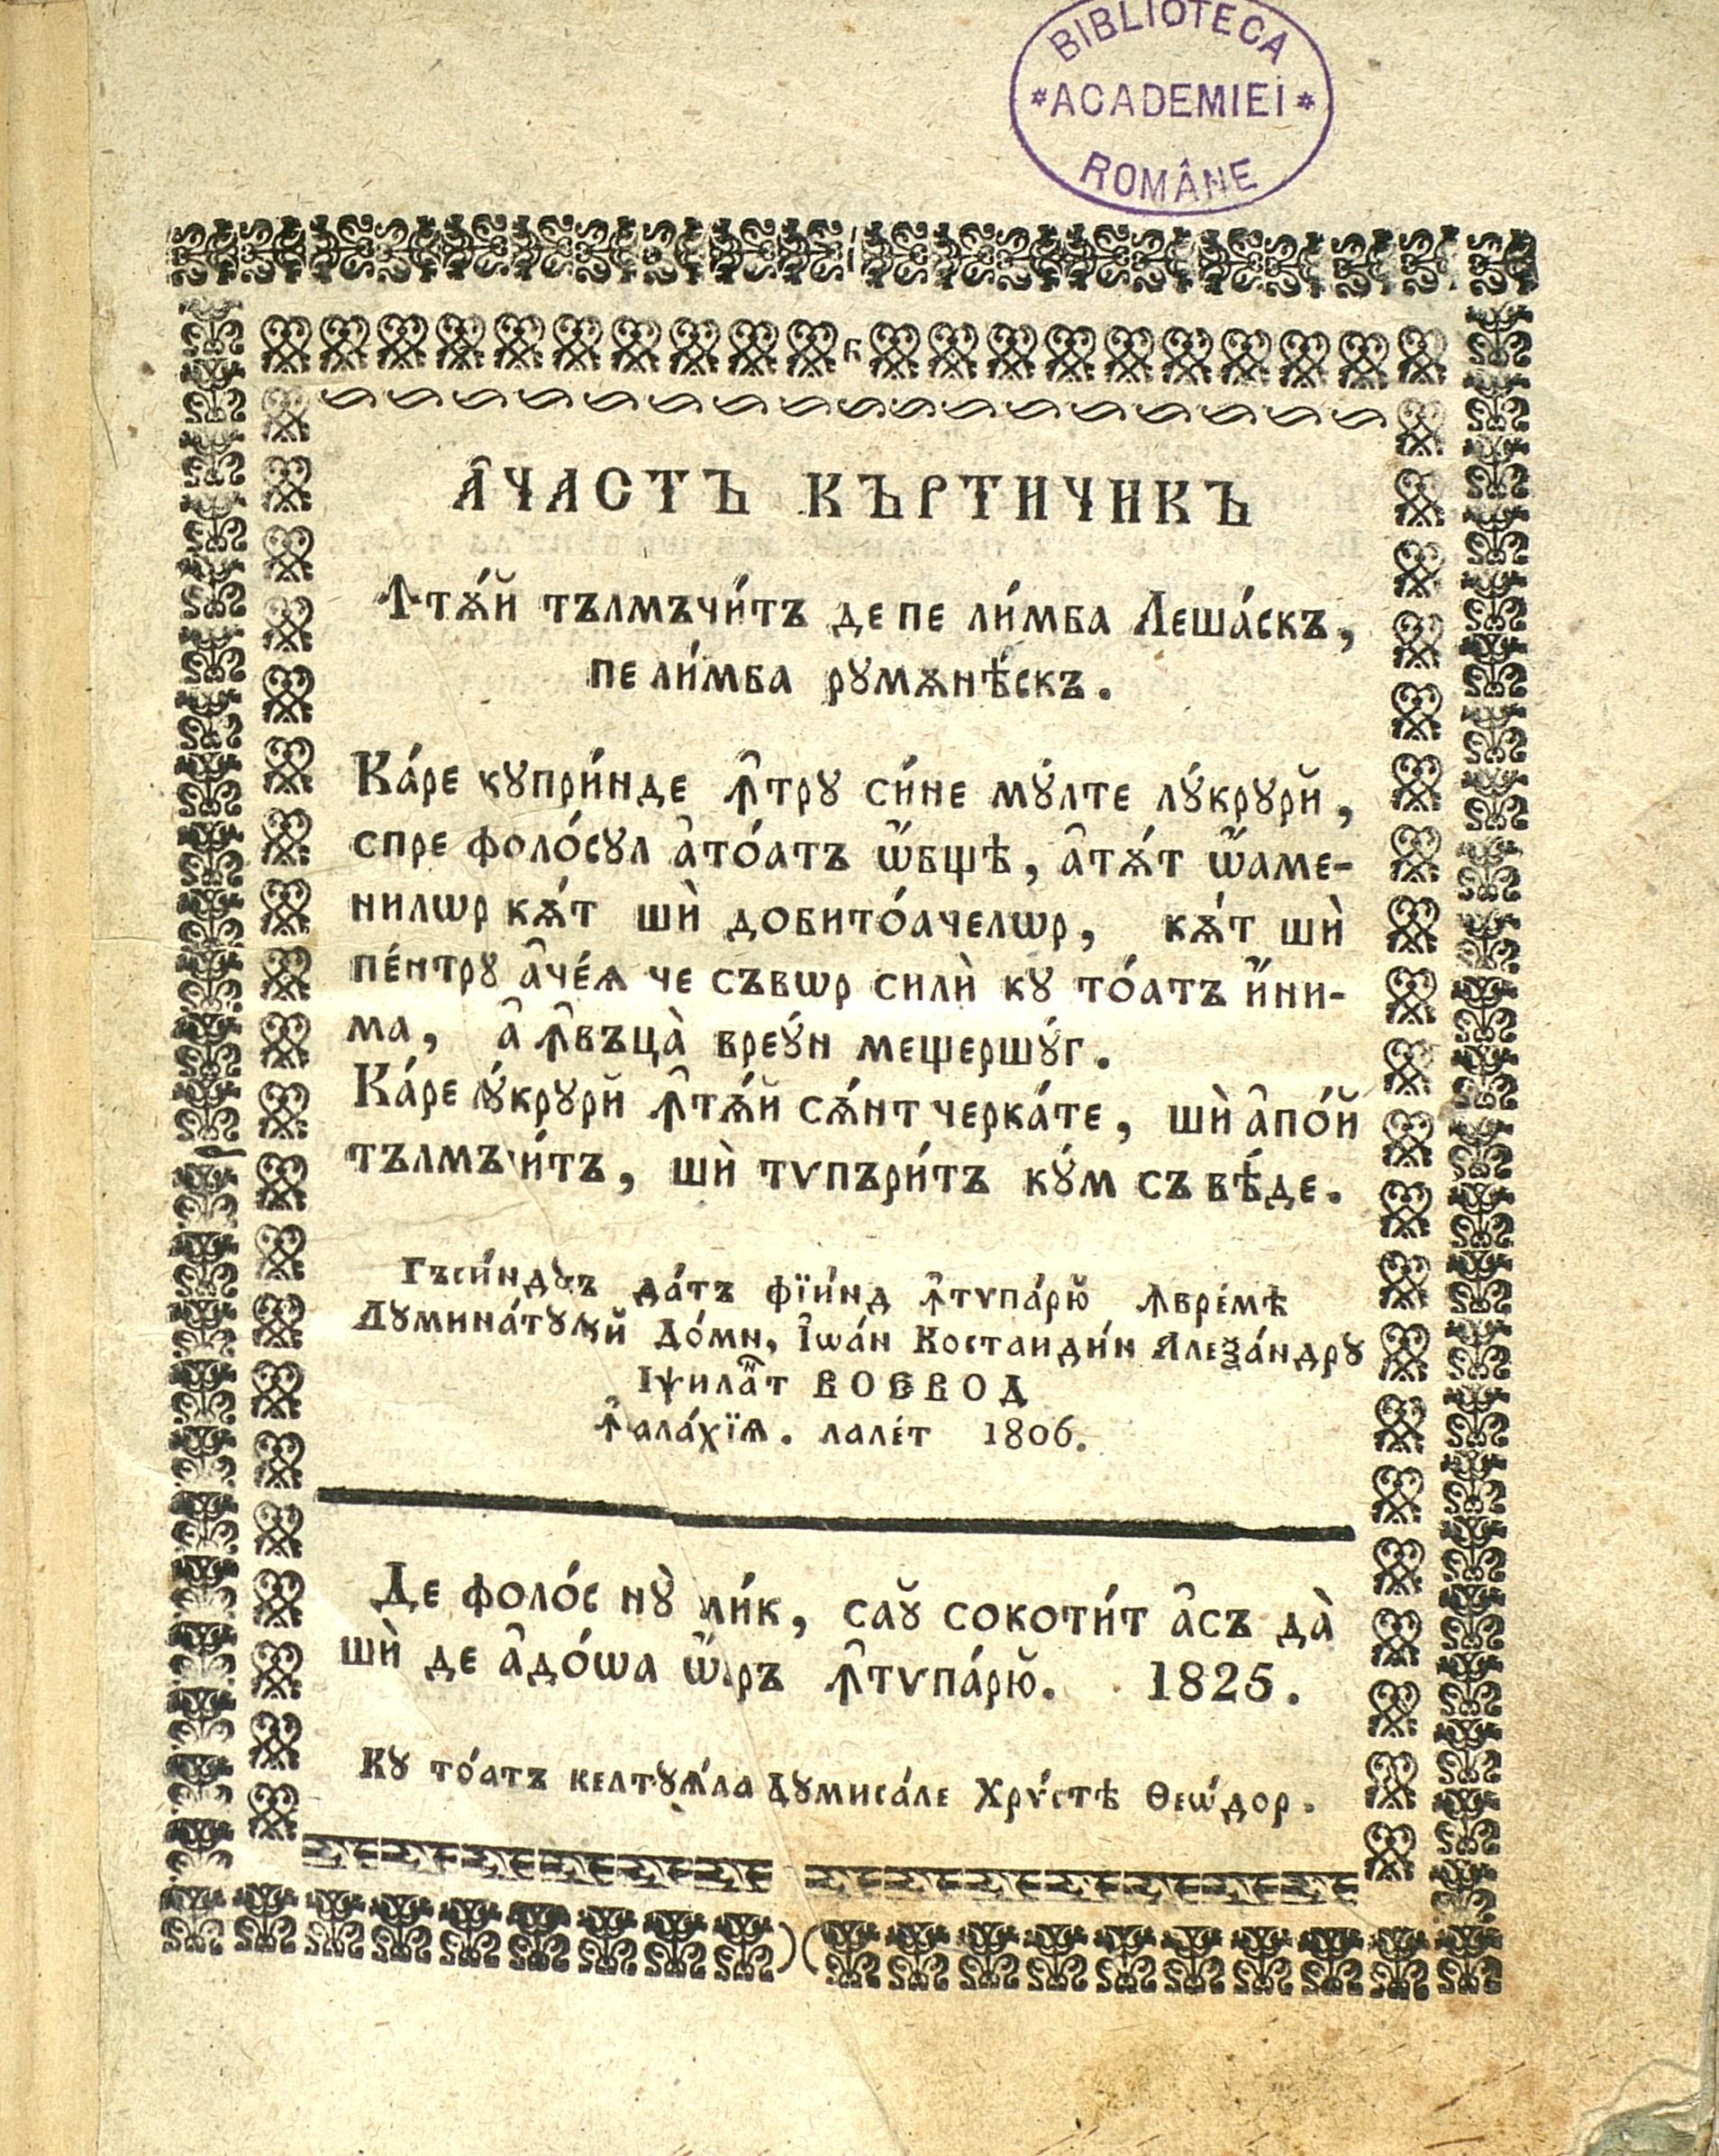 1825 coperta